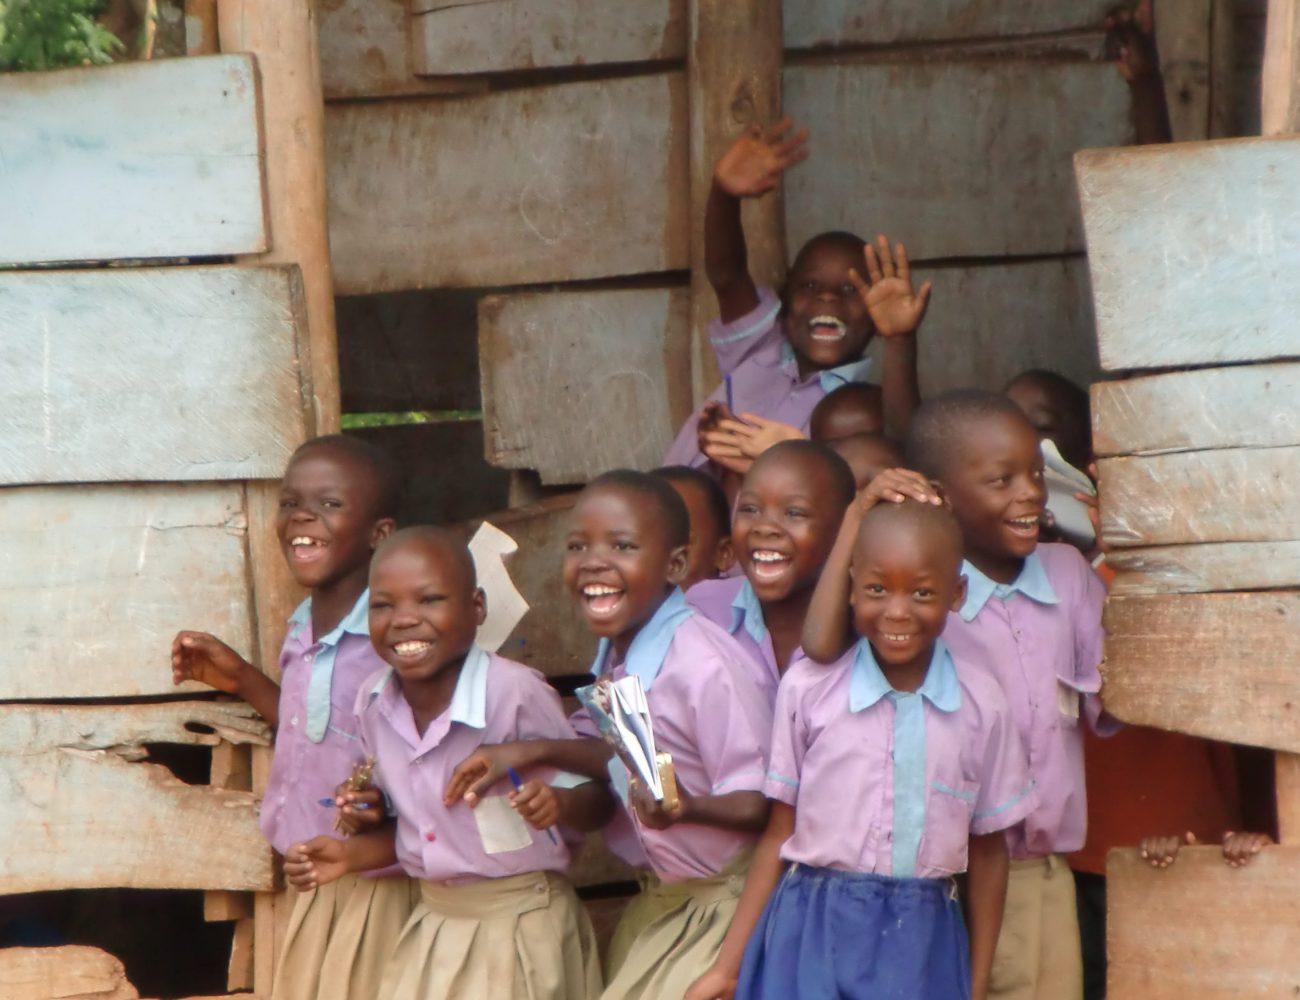 Kinder - Die Zukunft Ugandas